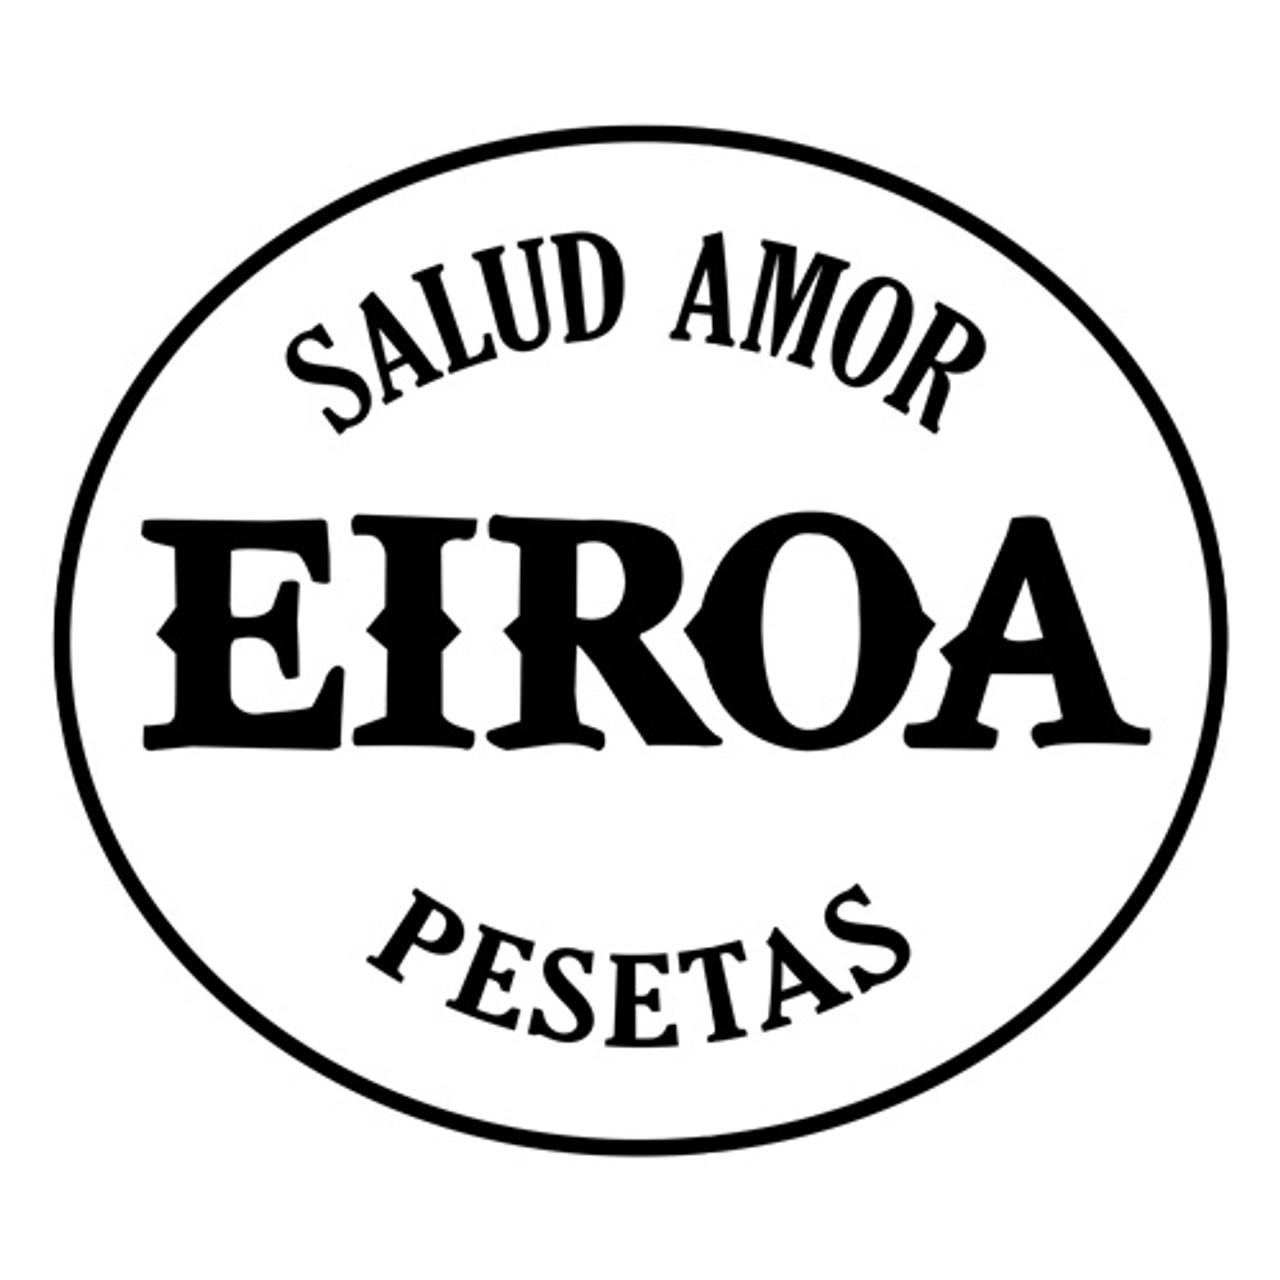 Eiroa CBT Maduro 60 X 6 Cigars - 6 x 60 (Box of 20)